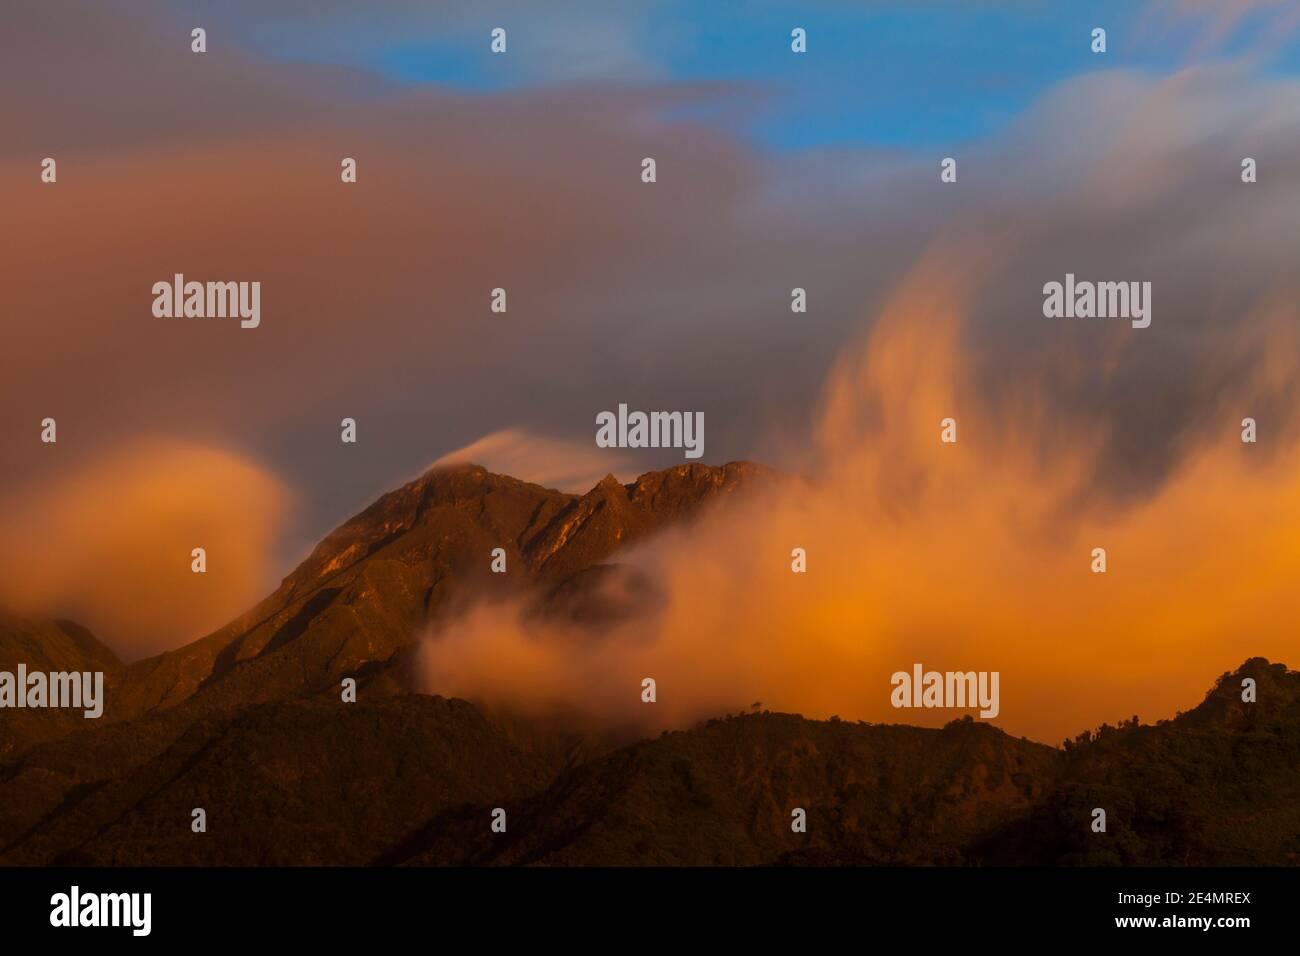 Ultima sera luce su Volcan Baru, 3475 m, provincia di Chiriqui, Repubblica di Panama. Foto Stock